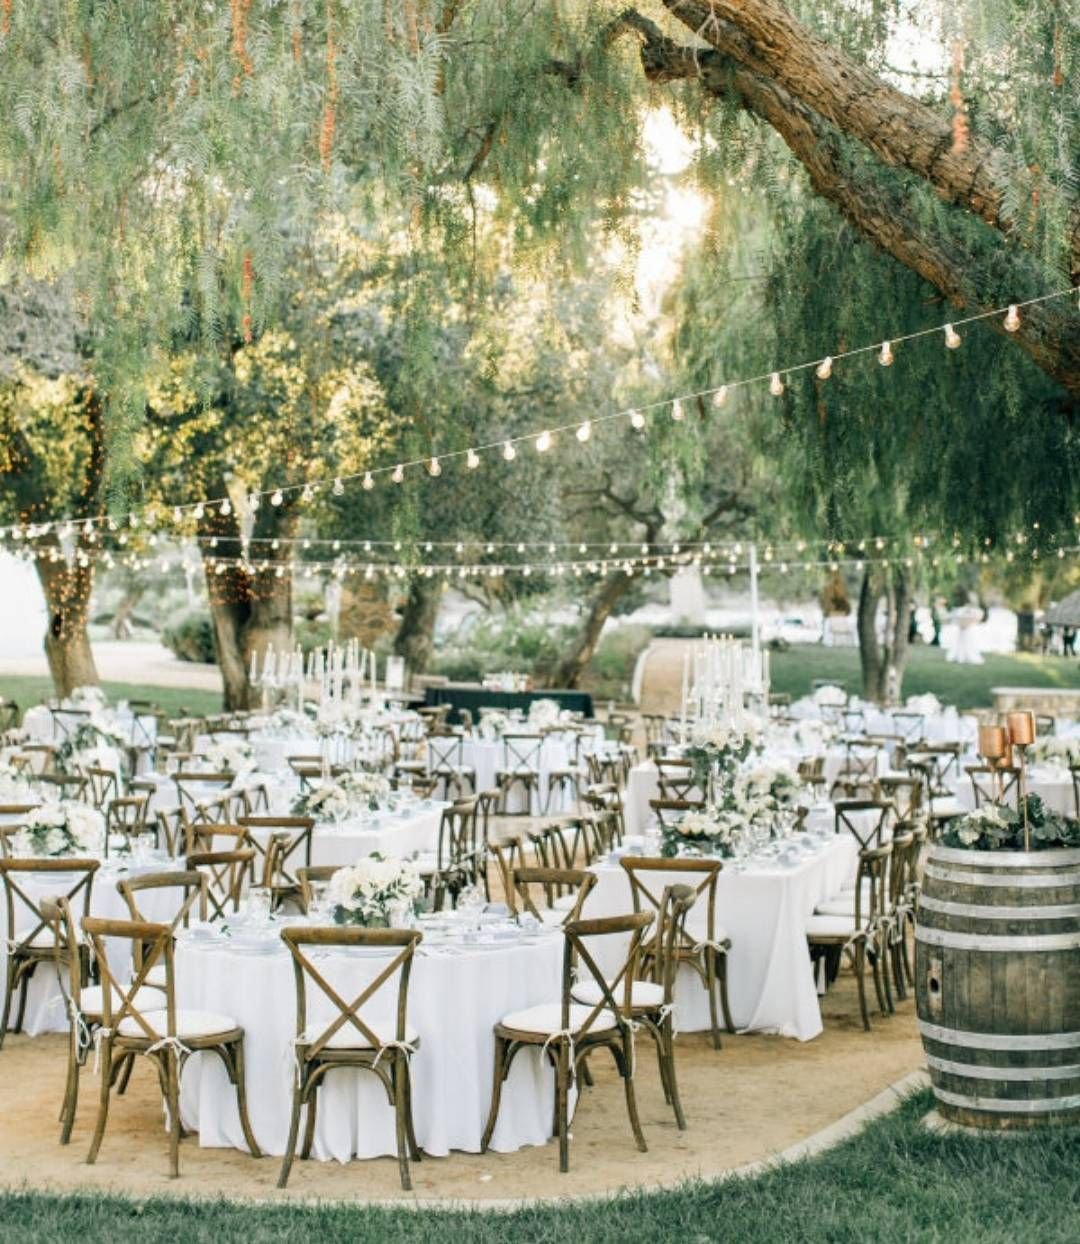 Pond Garden Wedding: Pin On ComfyShopping